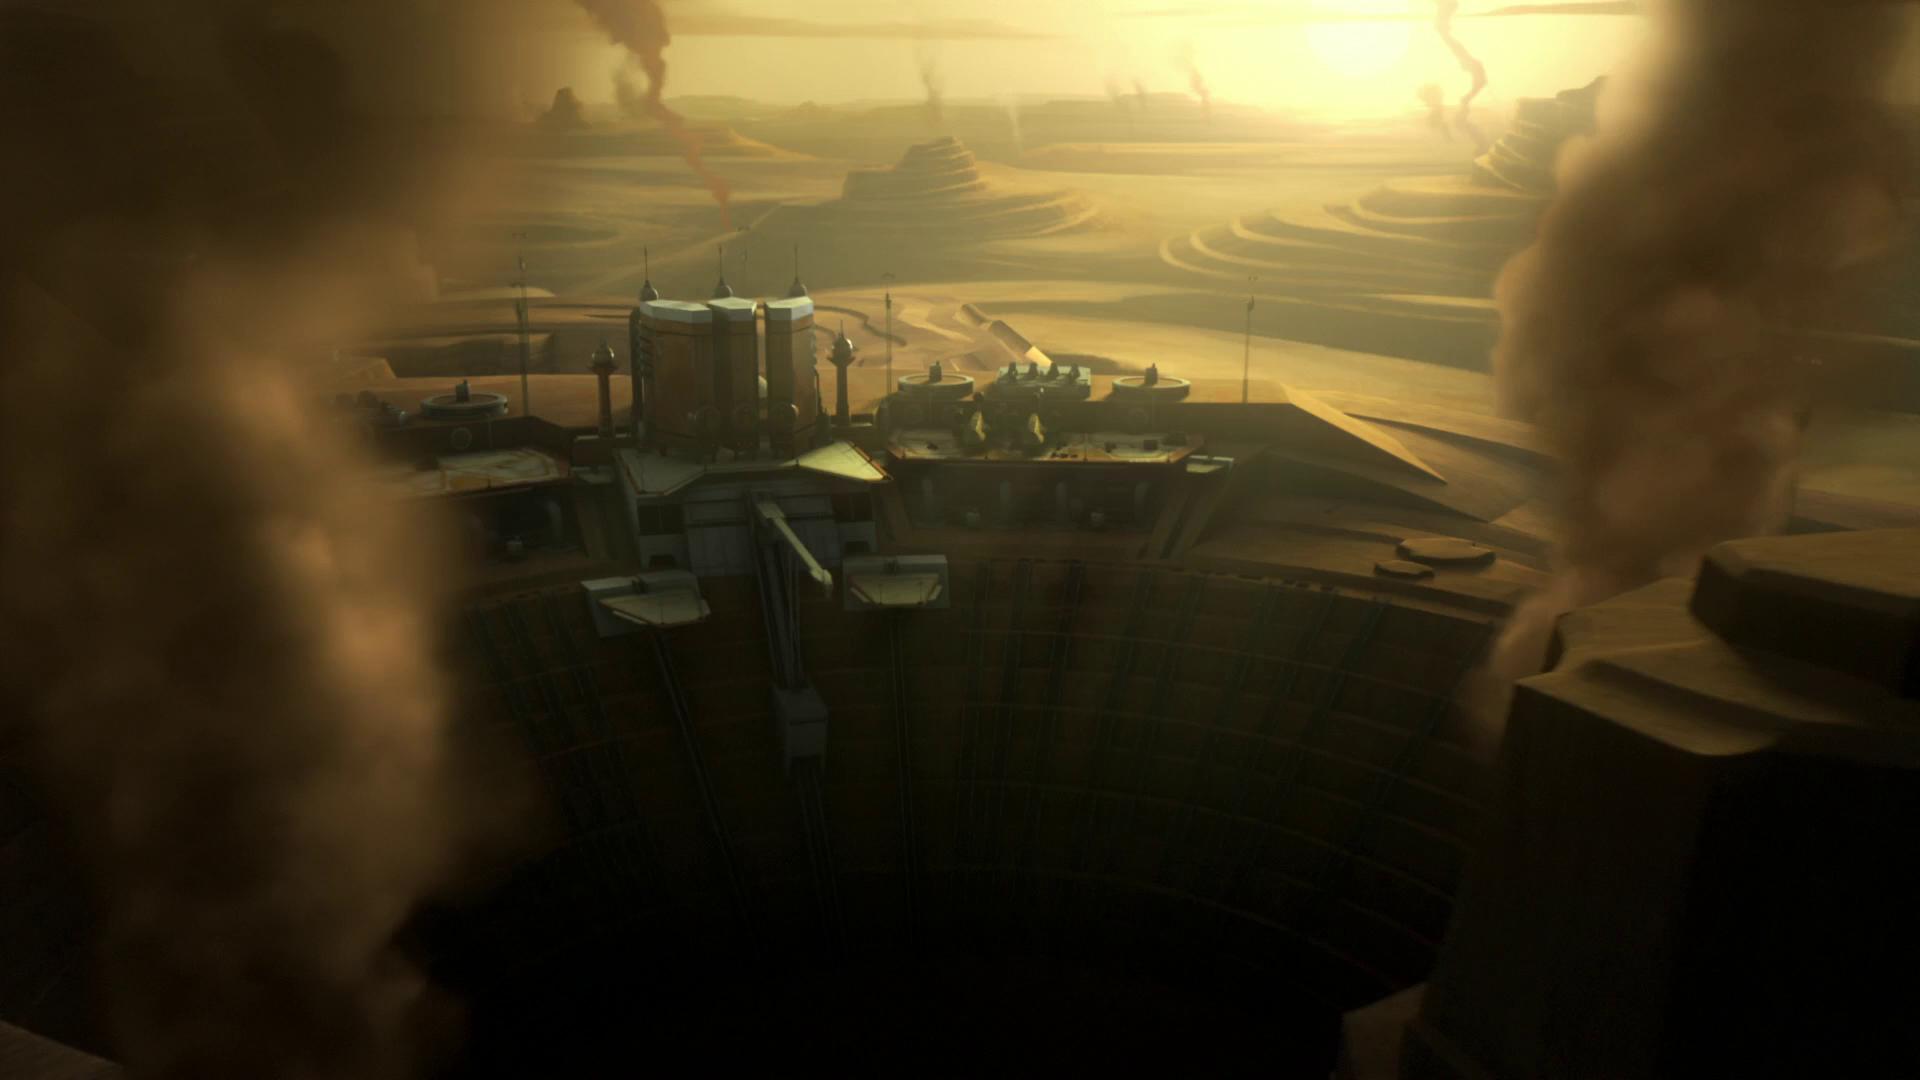 Spice mines of Kessel | Wookieepedia | FANDOM powered by Wikia